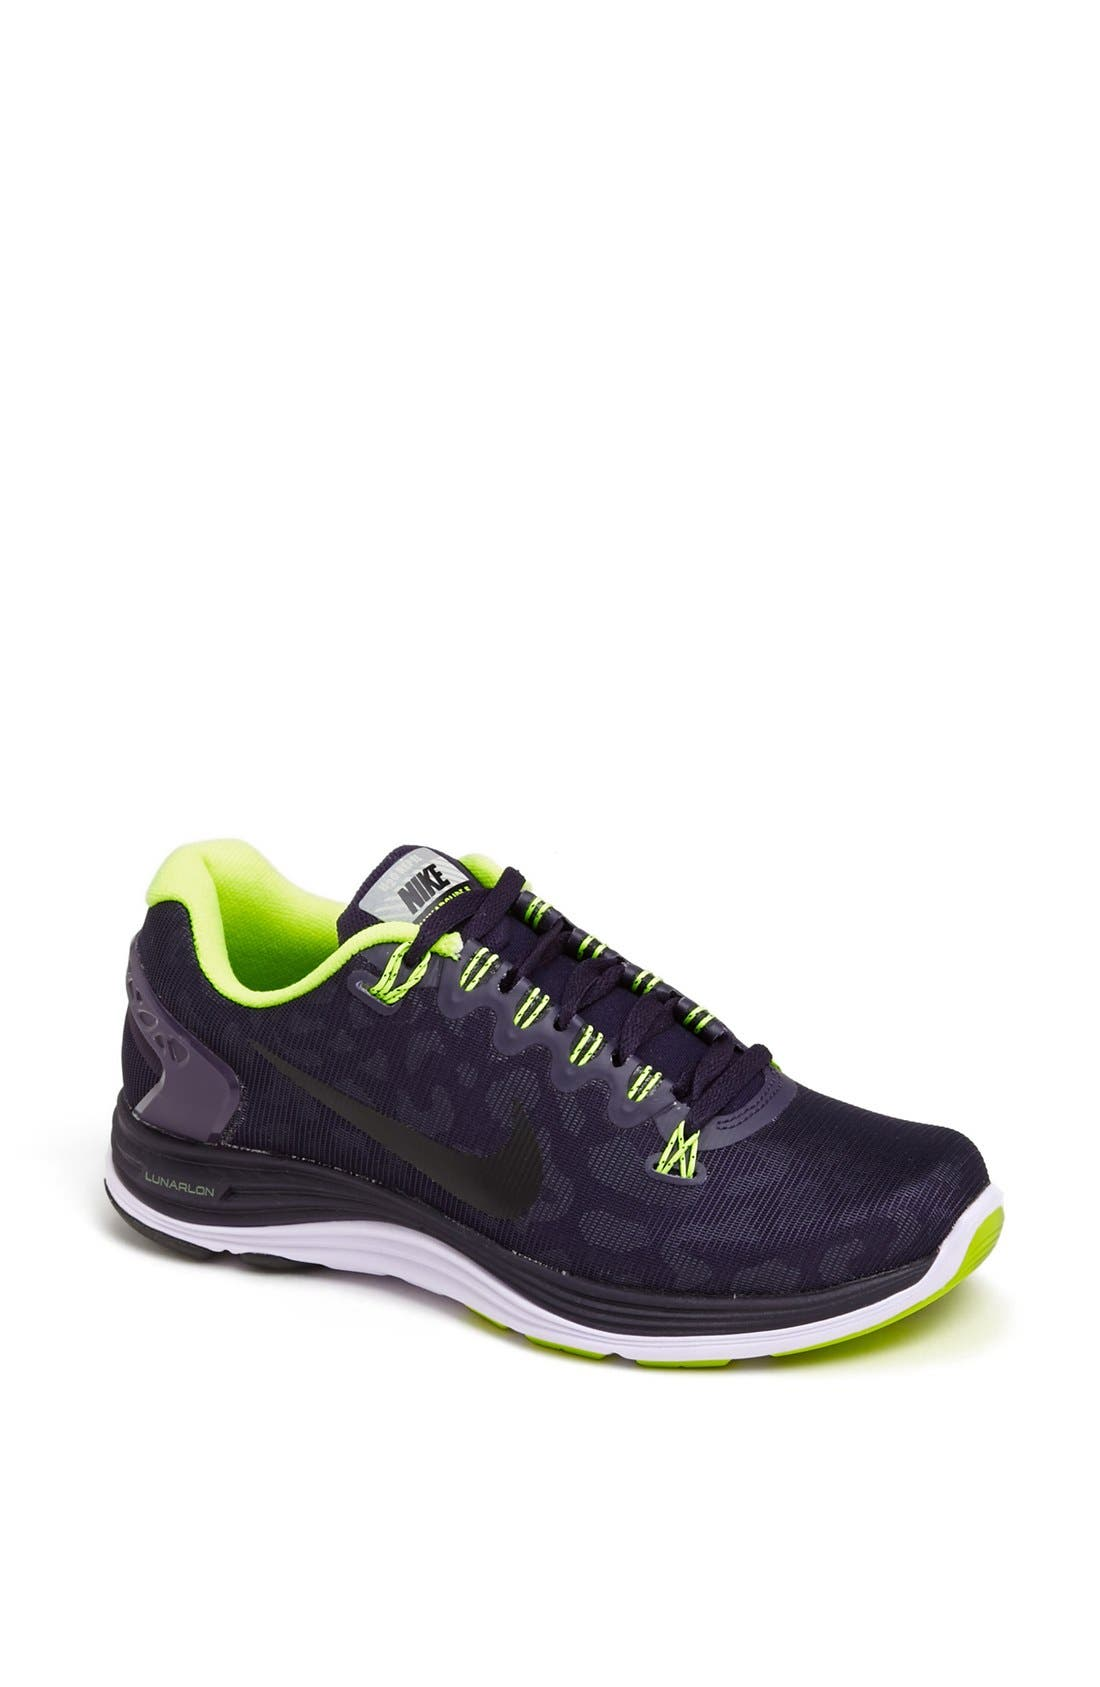 Main Image - Nike 'LunarGlide+ 5 Shield' Water Resistant Running Shoe